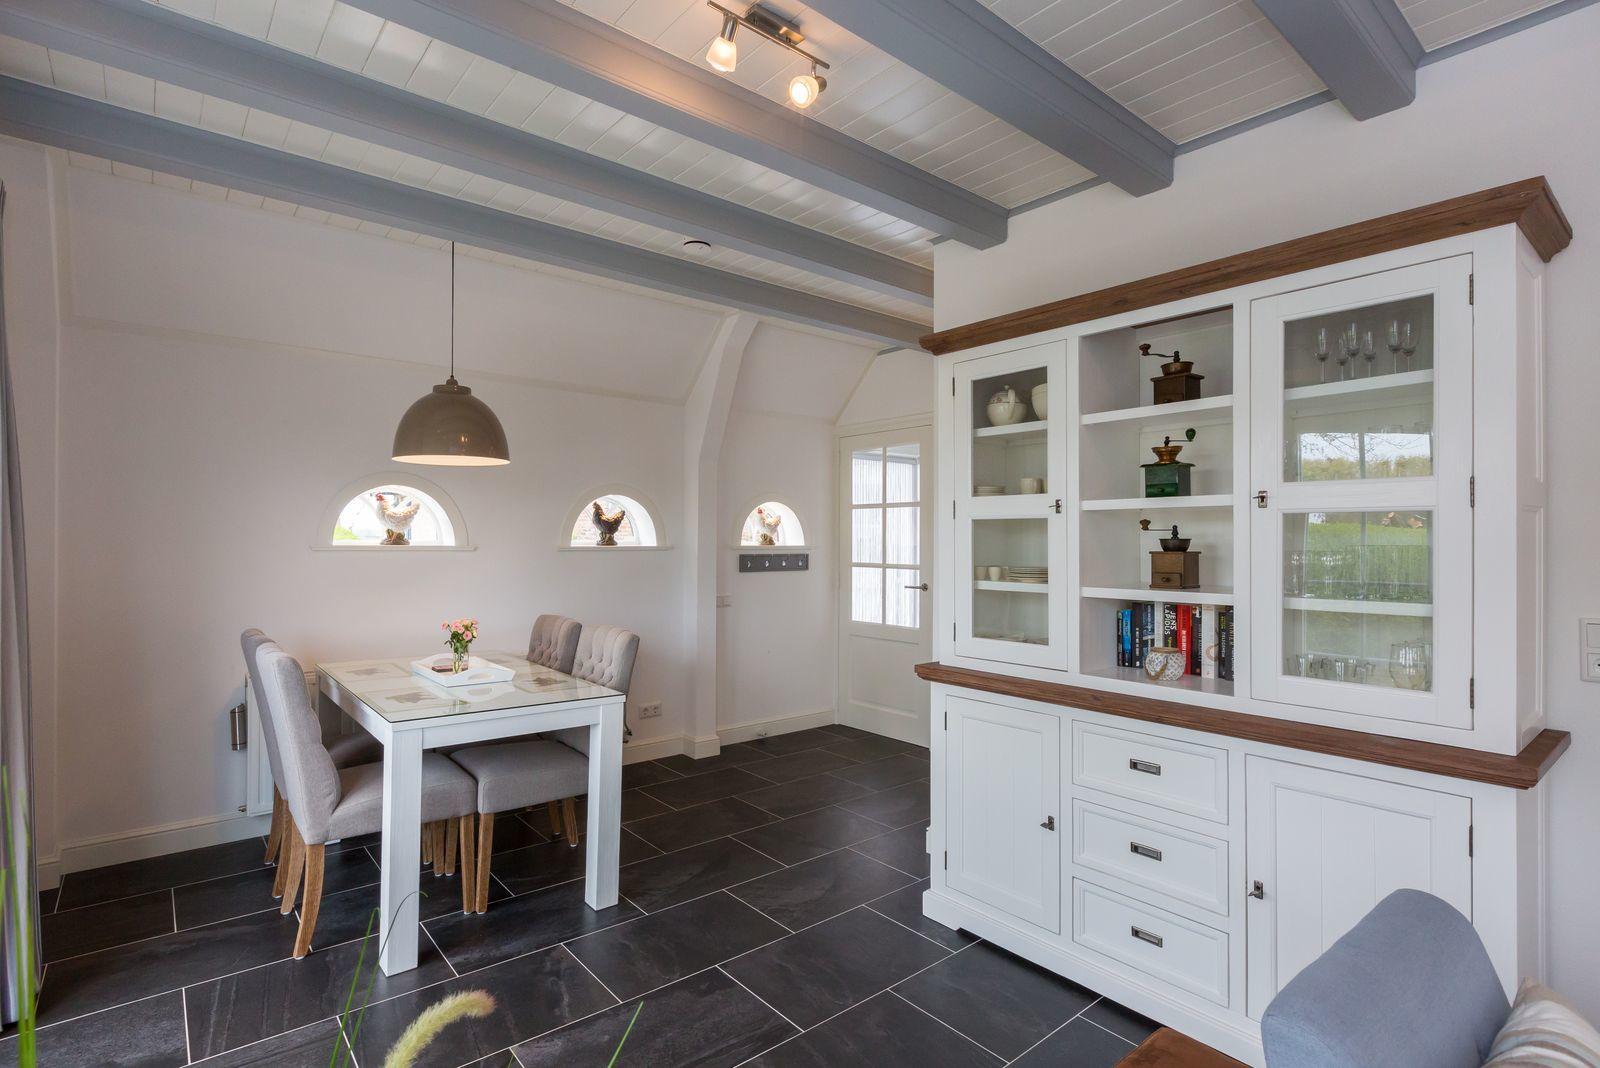 Holidayhouse - Prelaatweg 11 | Westkapelle 't Kippekot